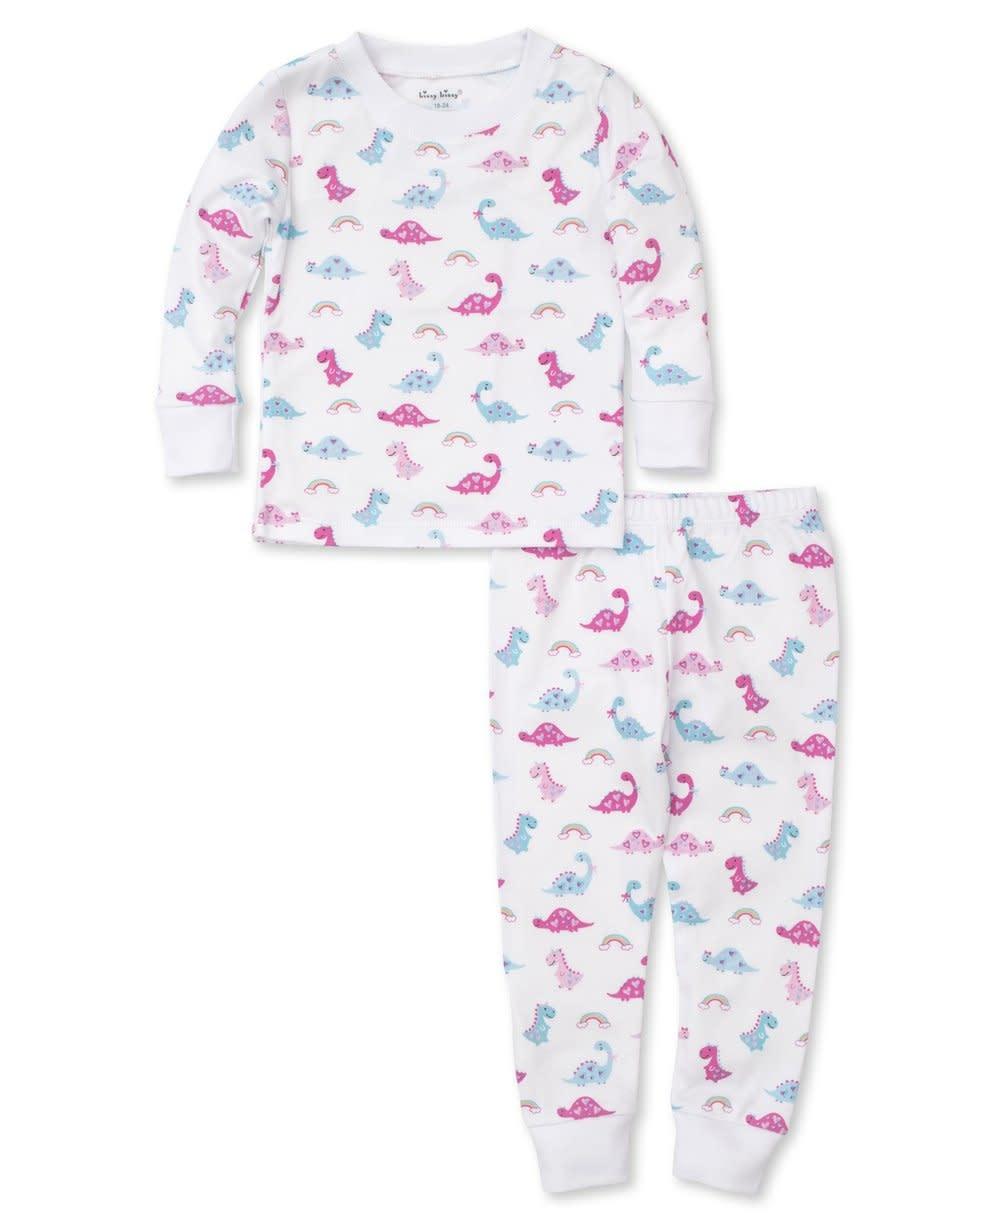 Kissy Kissy Dina Babies Pajamas